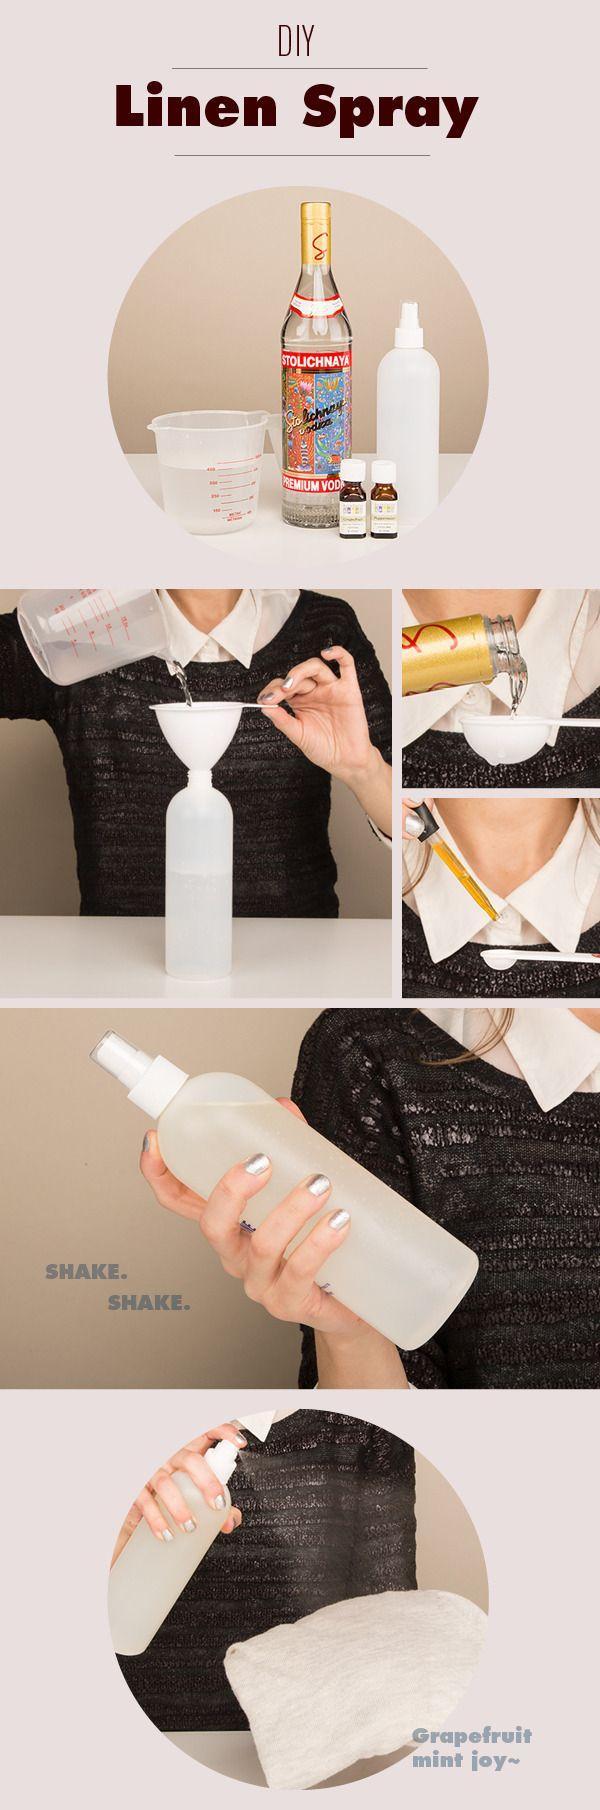 Perfume for Your Closet: DIY Linen Spray